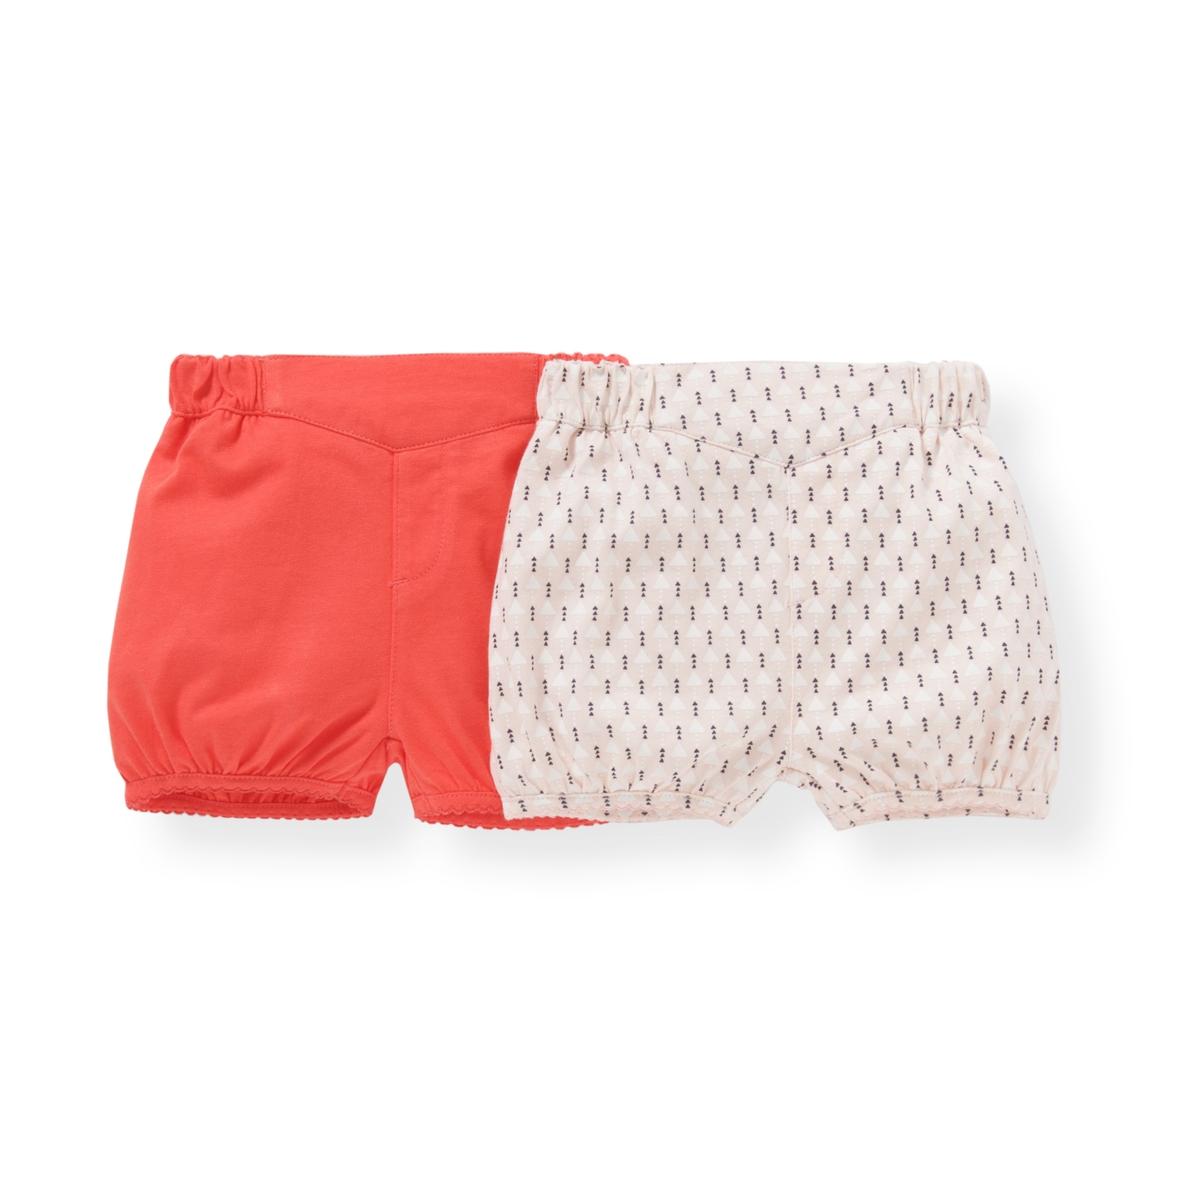 Комплект из 2 шортов из хлопка, 1 мес. - 3 года, знак Oeko Tex комплект из 4 футболок 1 мес 3 года oeko tex